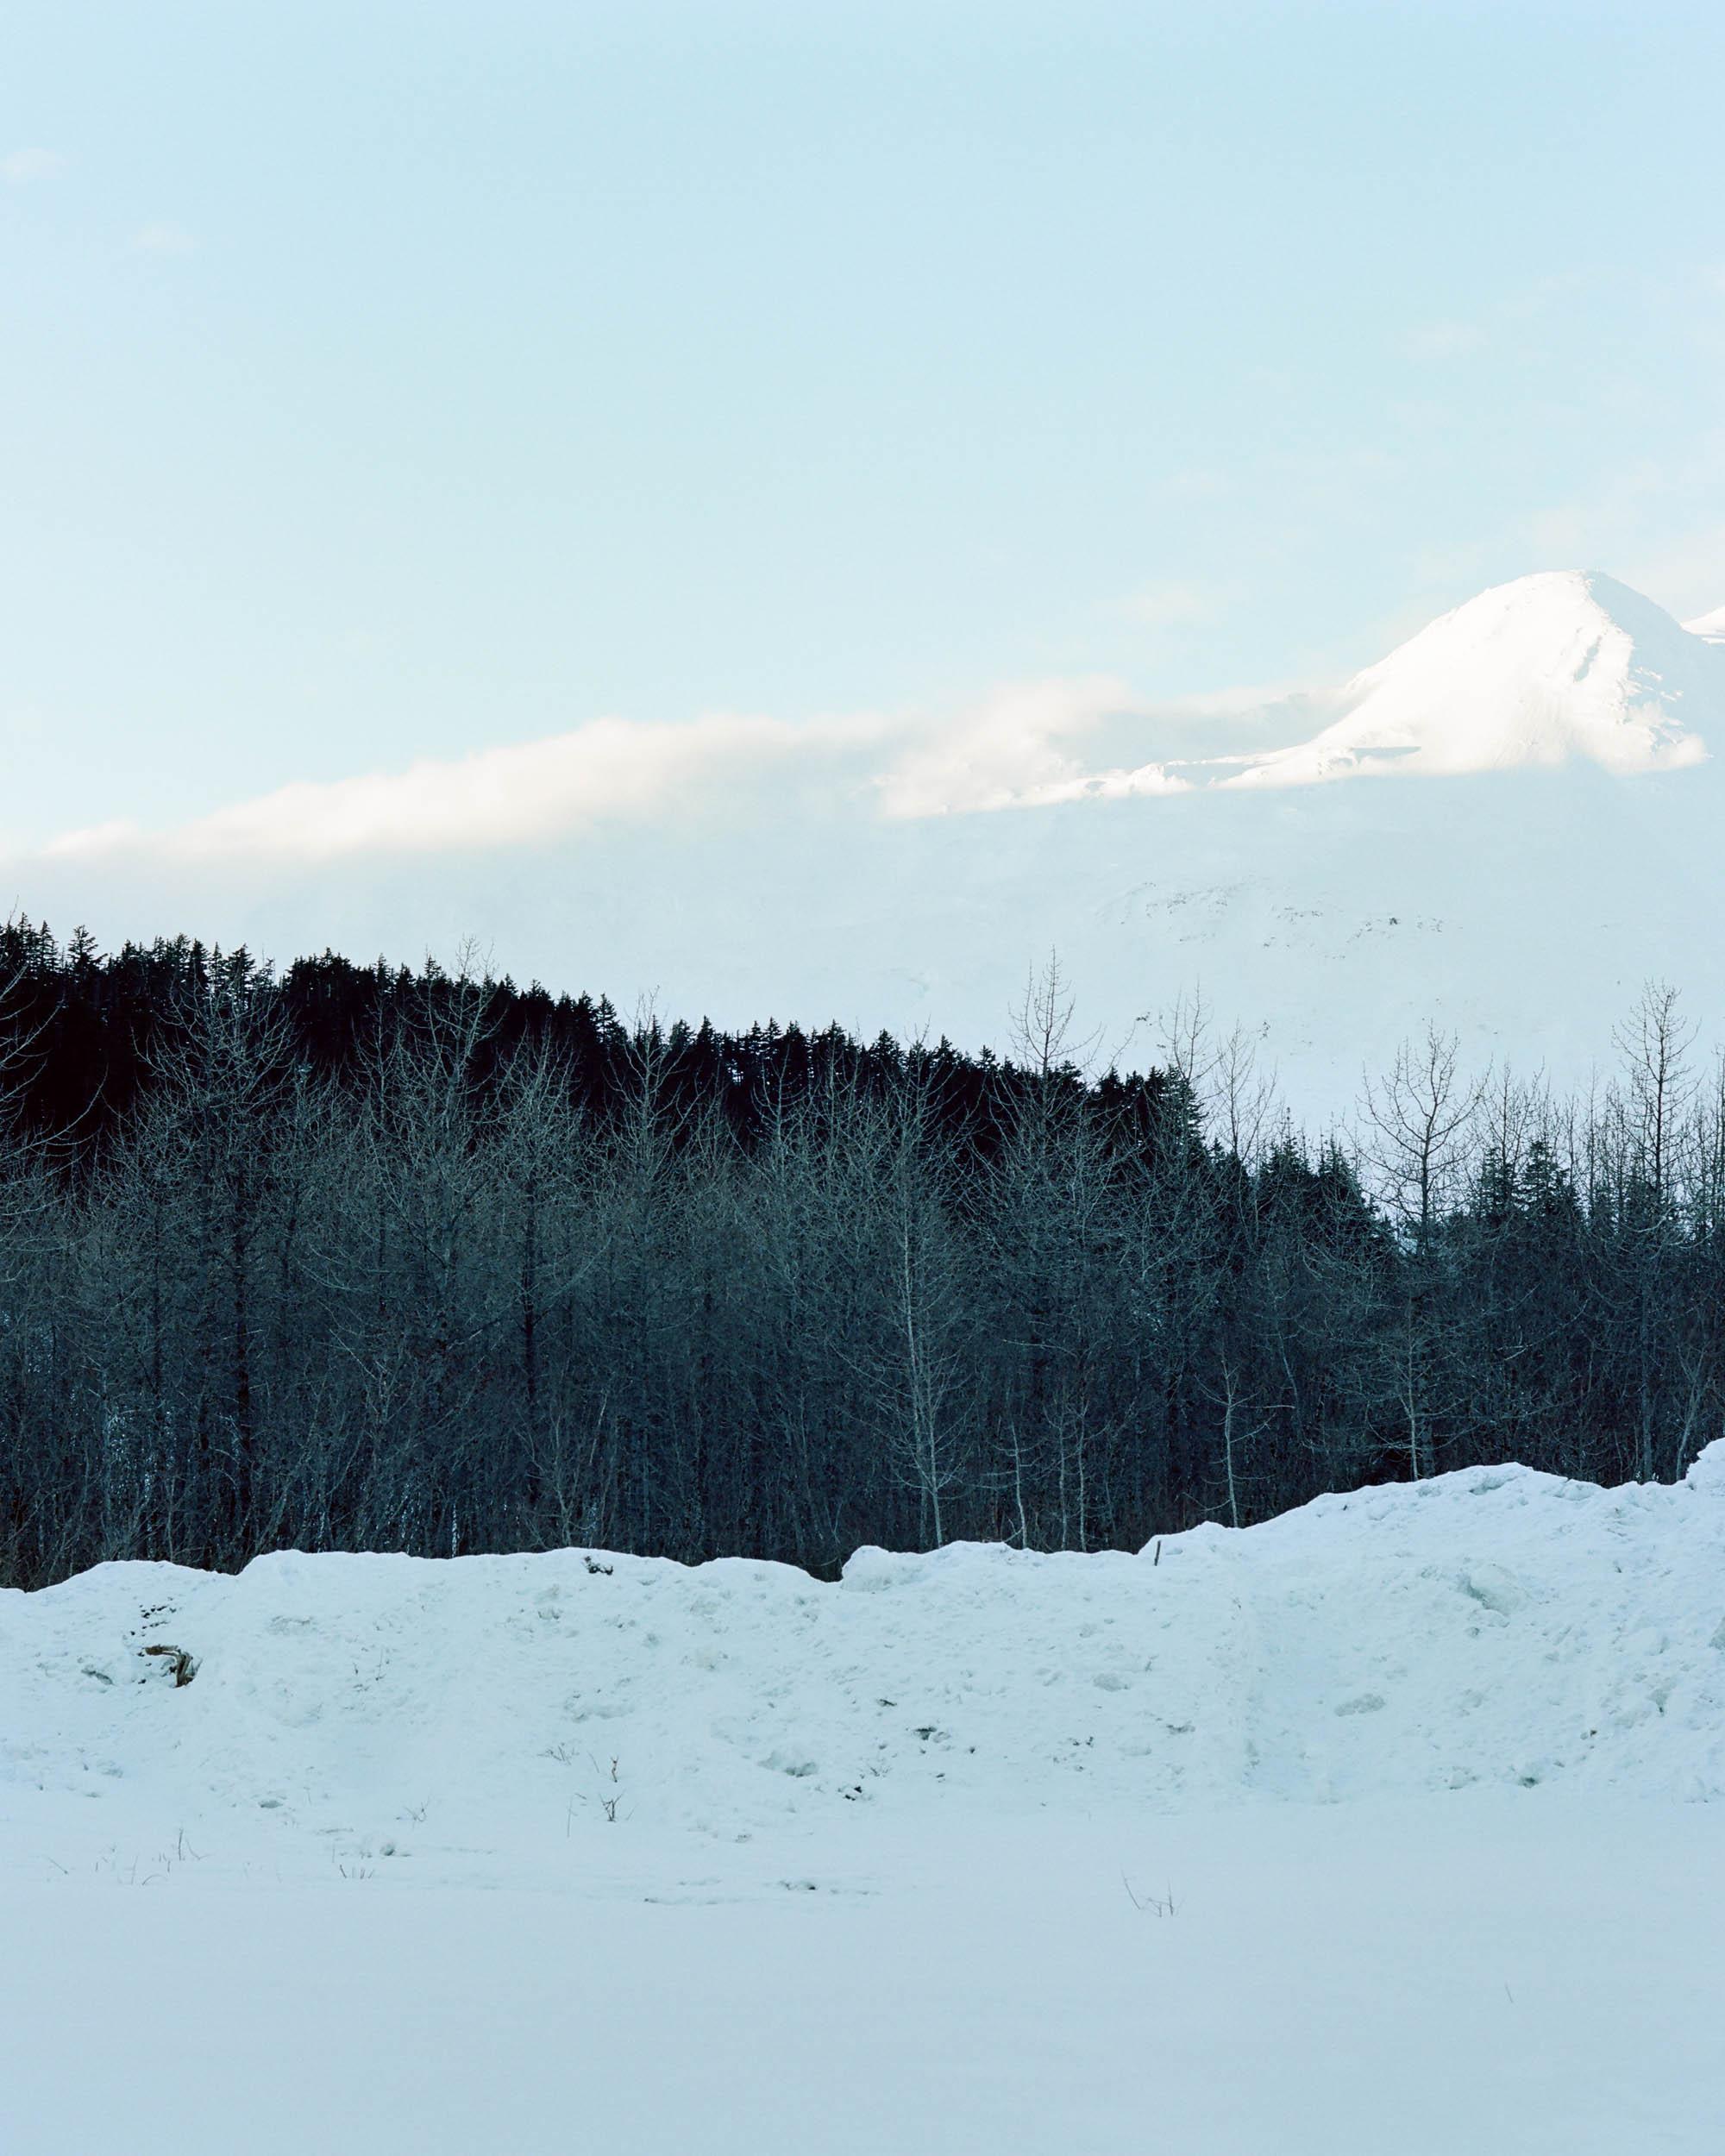 whittier-alaska-96810004.jpg